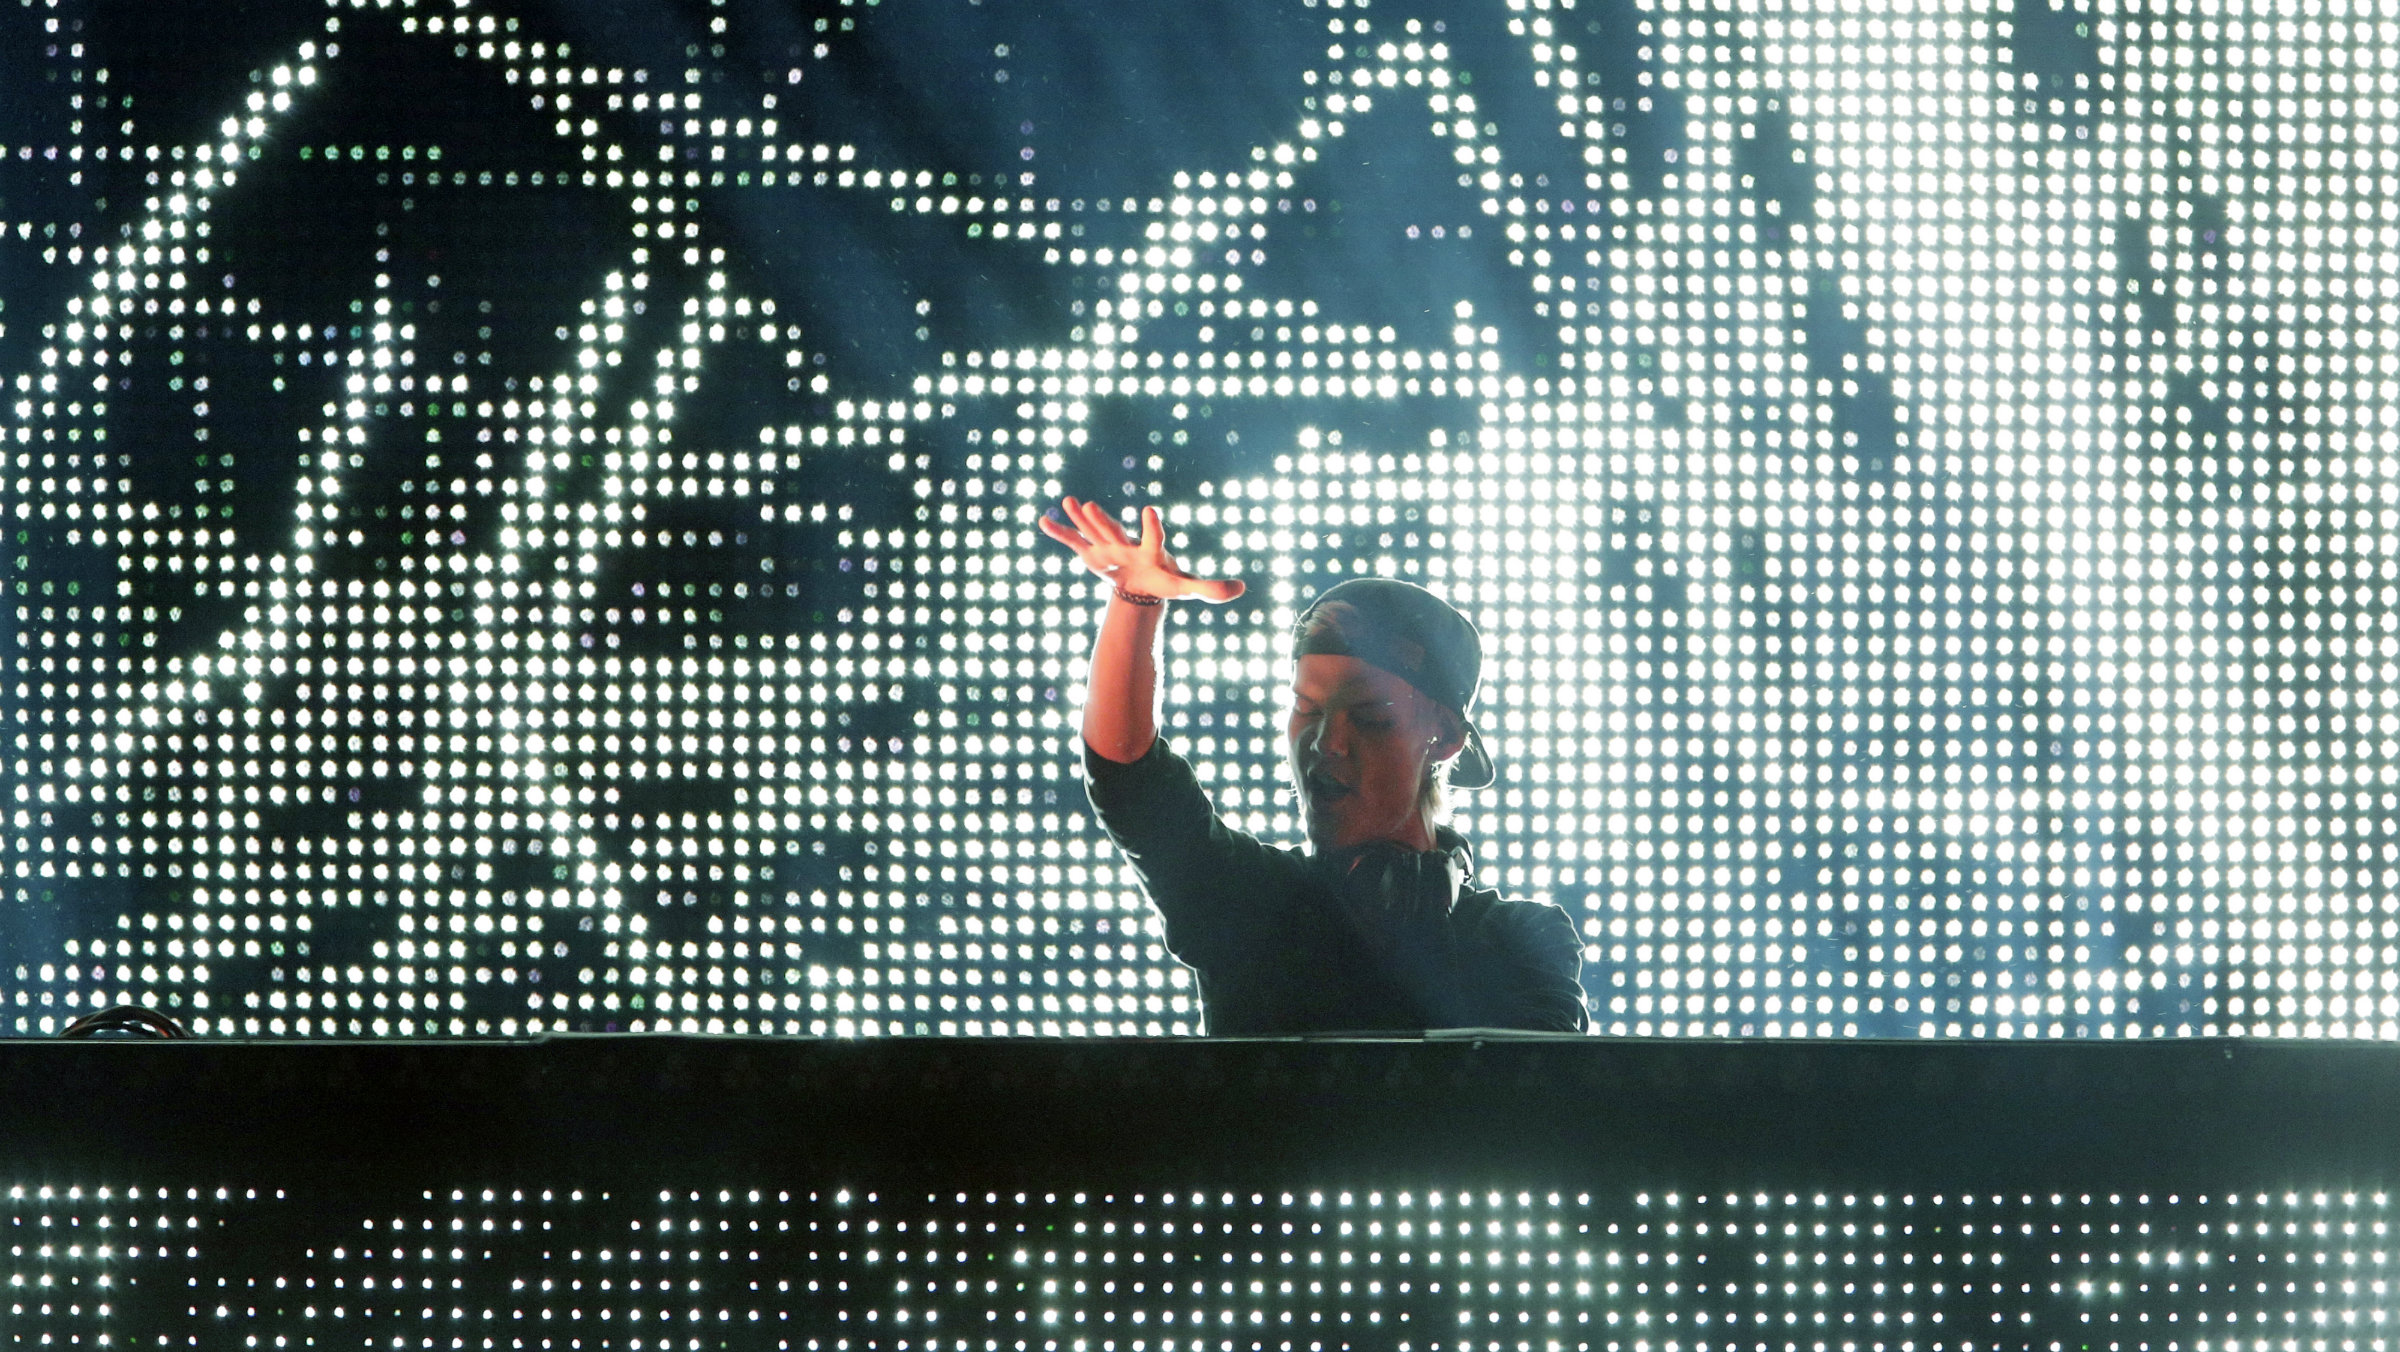 Avicii performs a DJ set